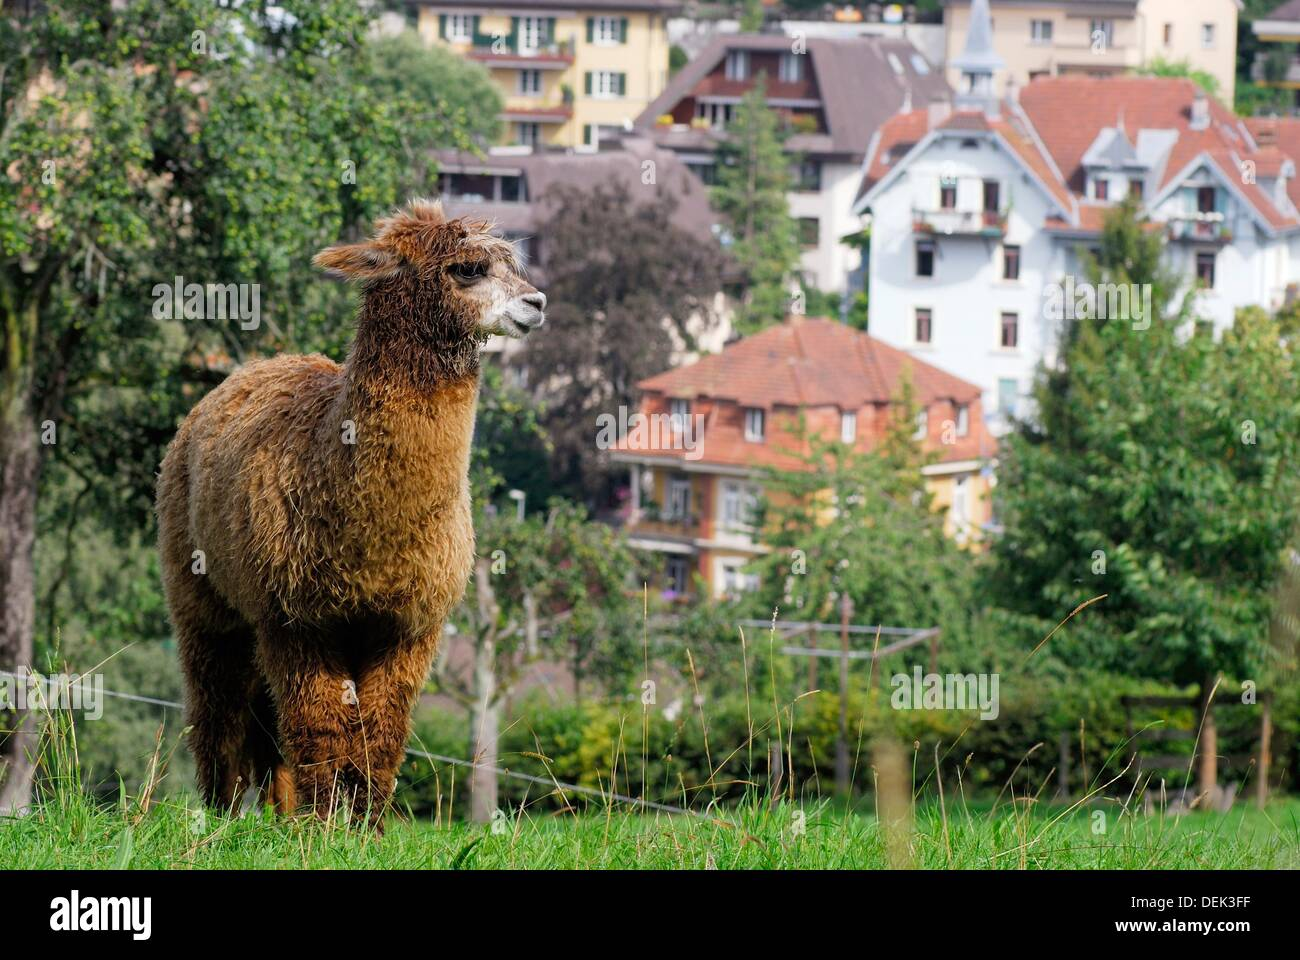 Domestic Alpaca in the periphery of Luzern, Switzerland - Stock Image